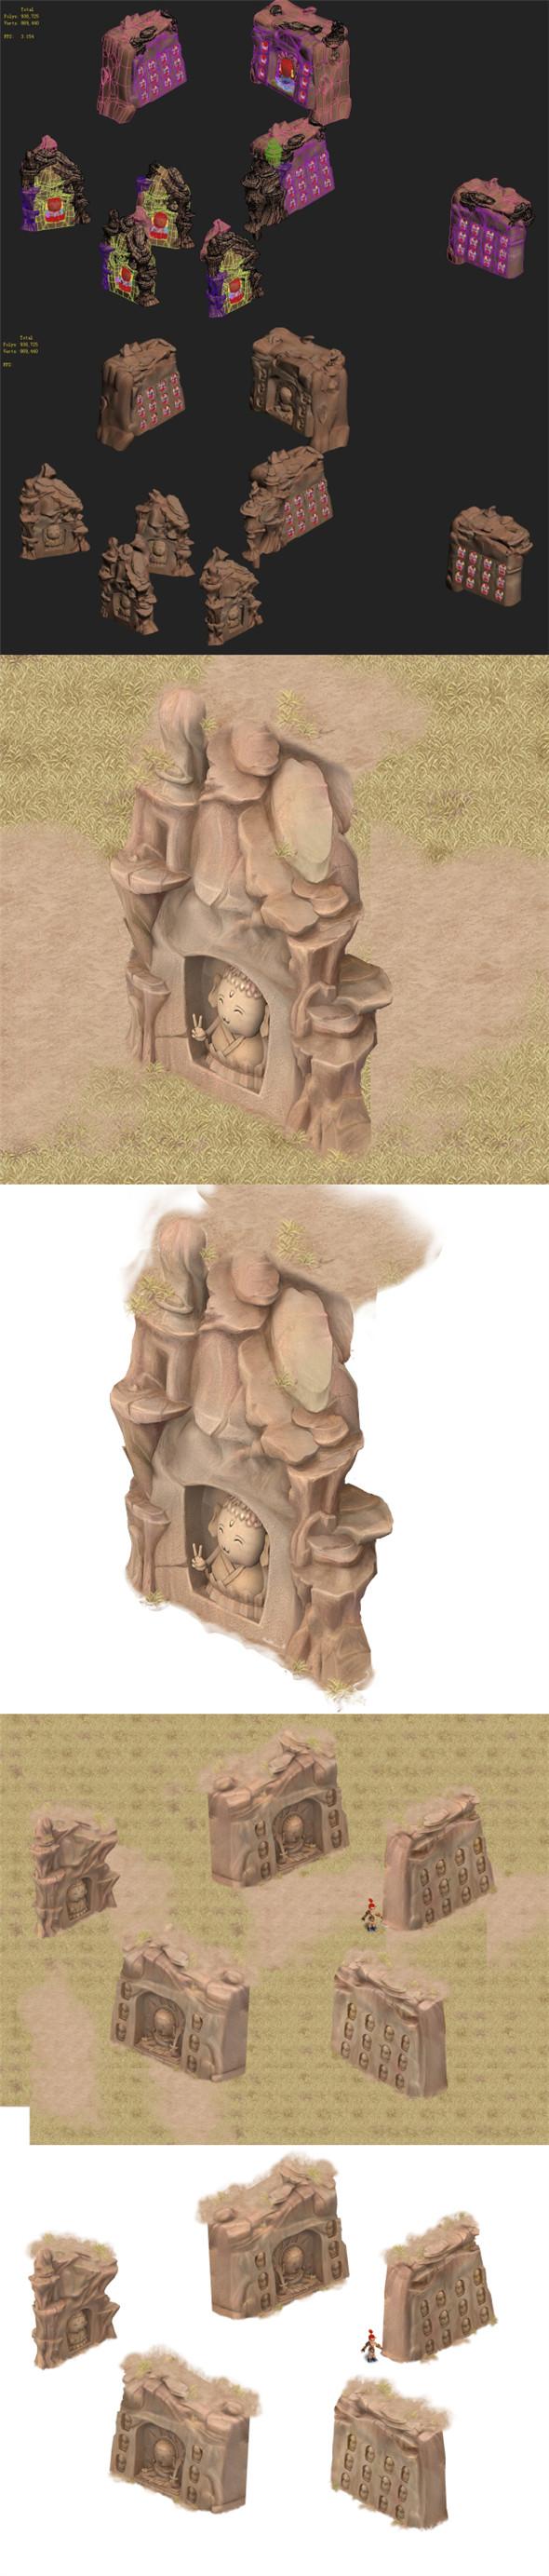 3DOcean Cartoon Edition Thousand Buddha Rocks 03 20182380